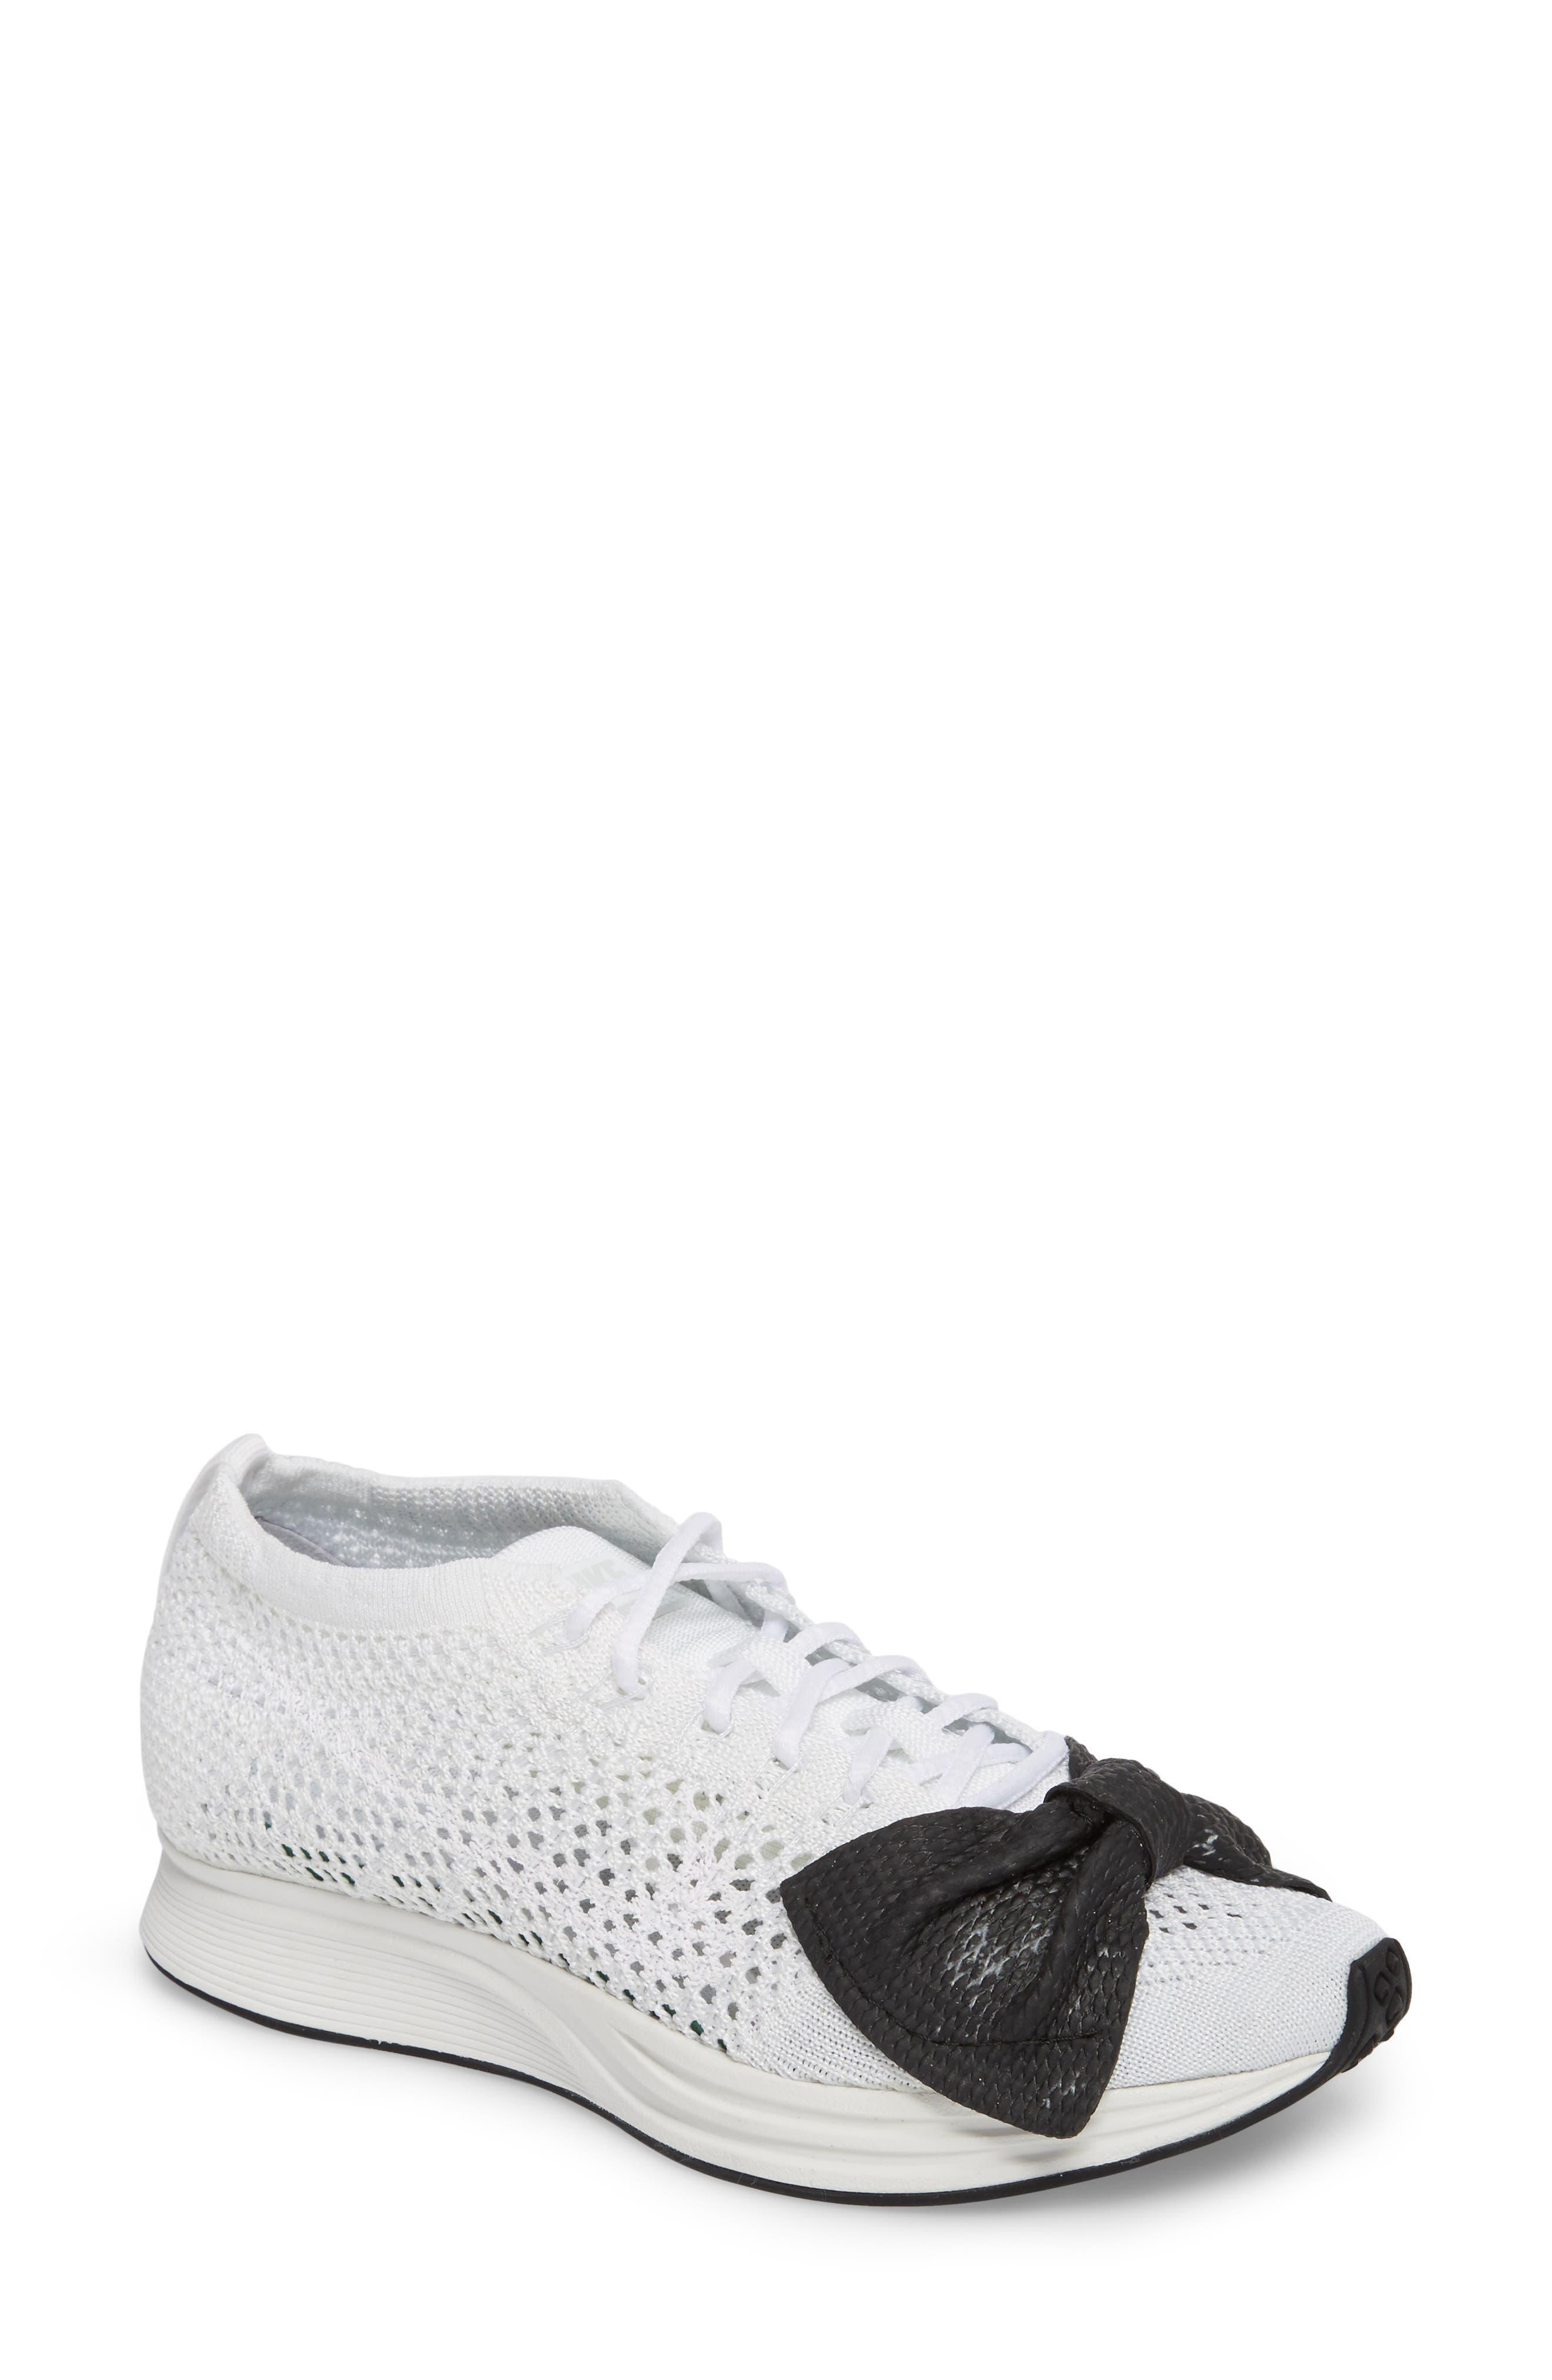 Comme des Garçons x Nike Bow Flyknit Racer Sneaker